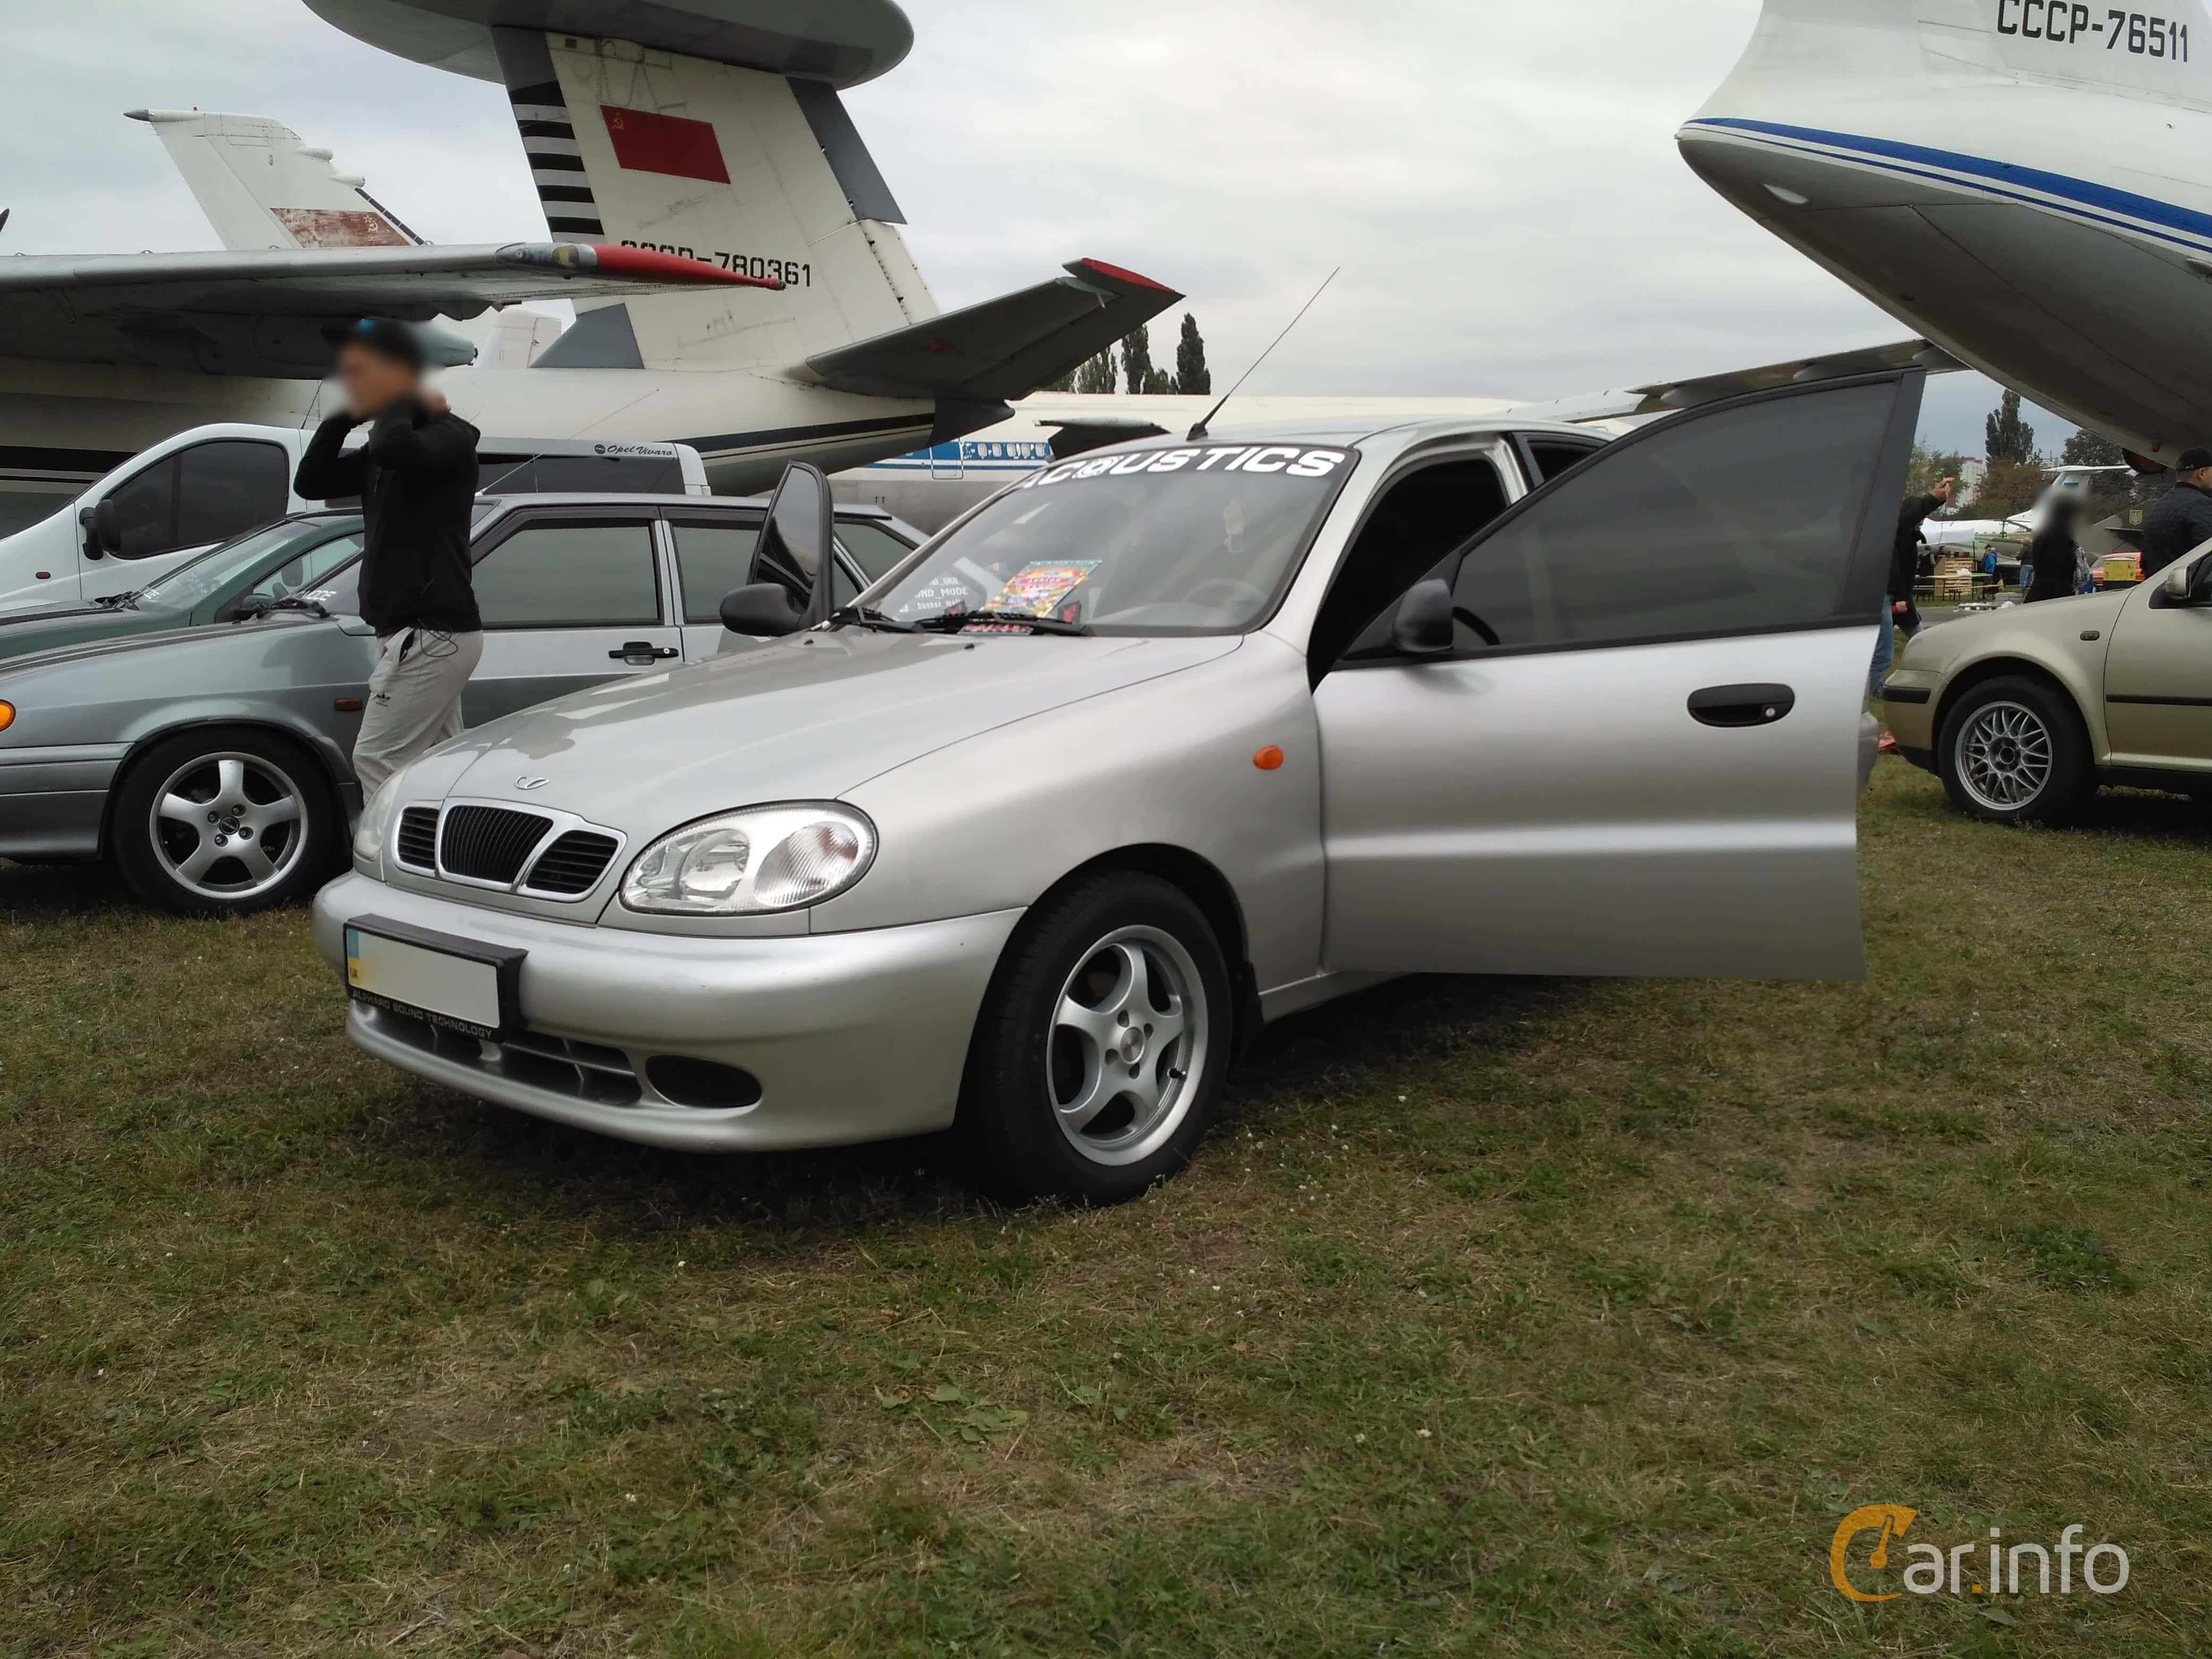 6 images of Daewoo Lanos Sedan 2004 by PavelYakovenko